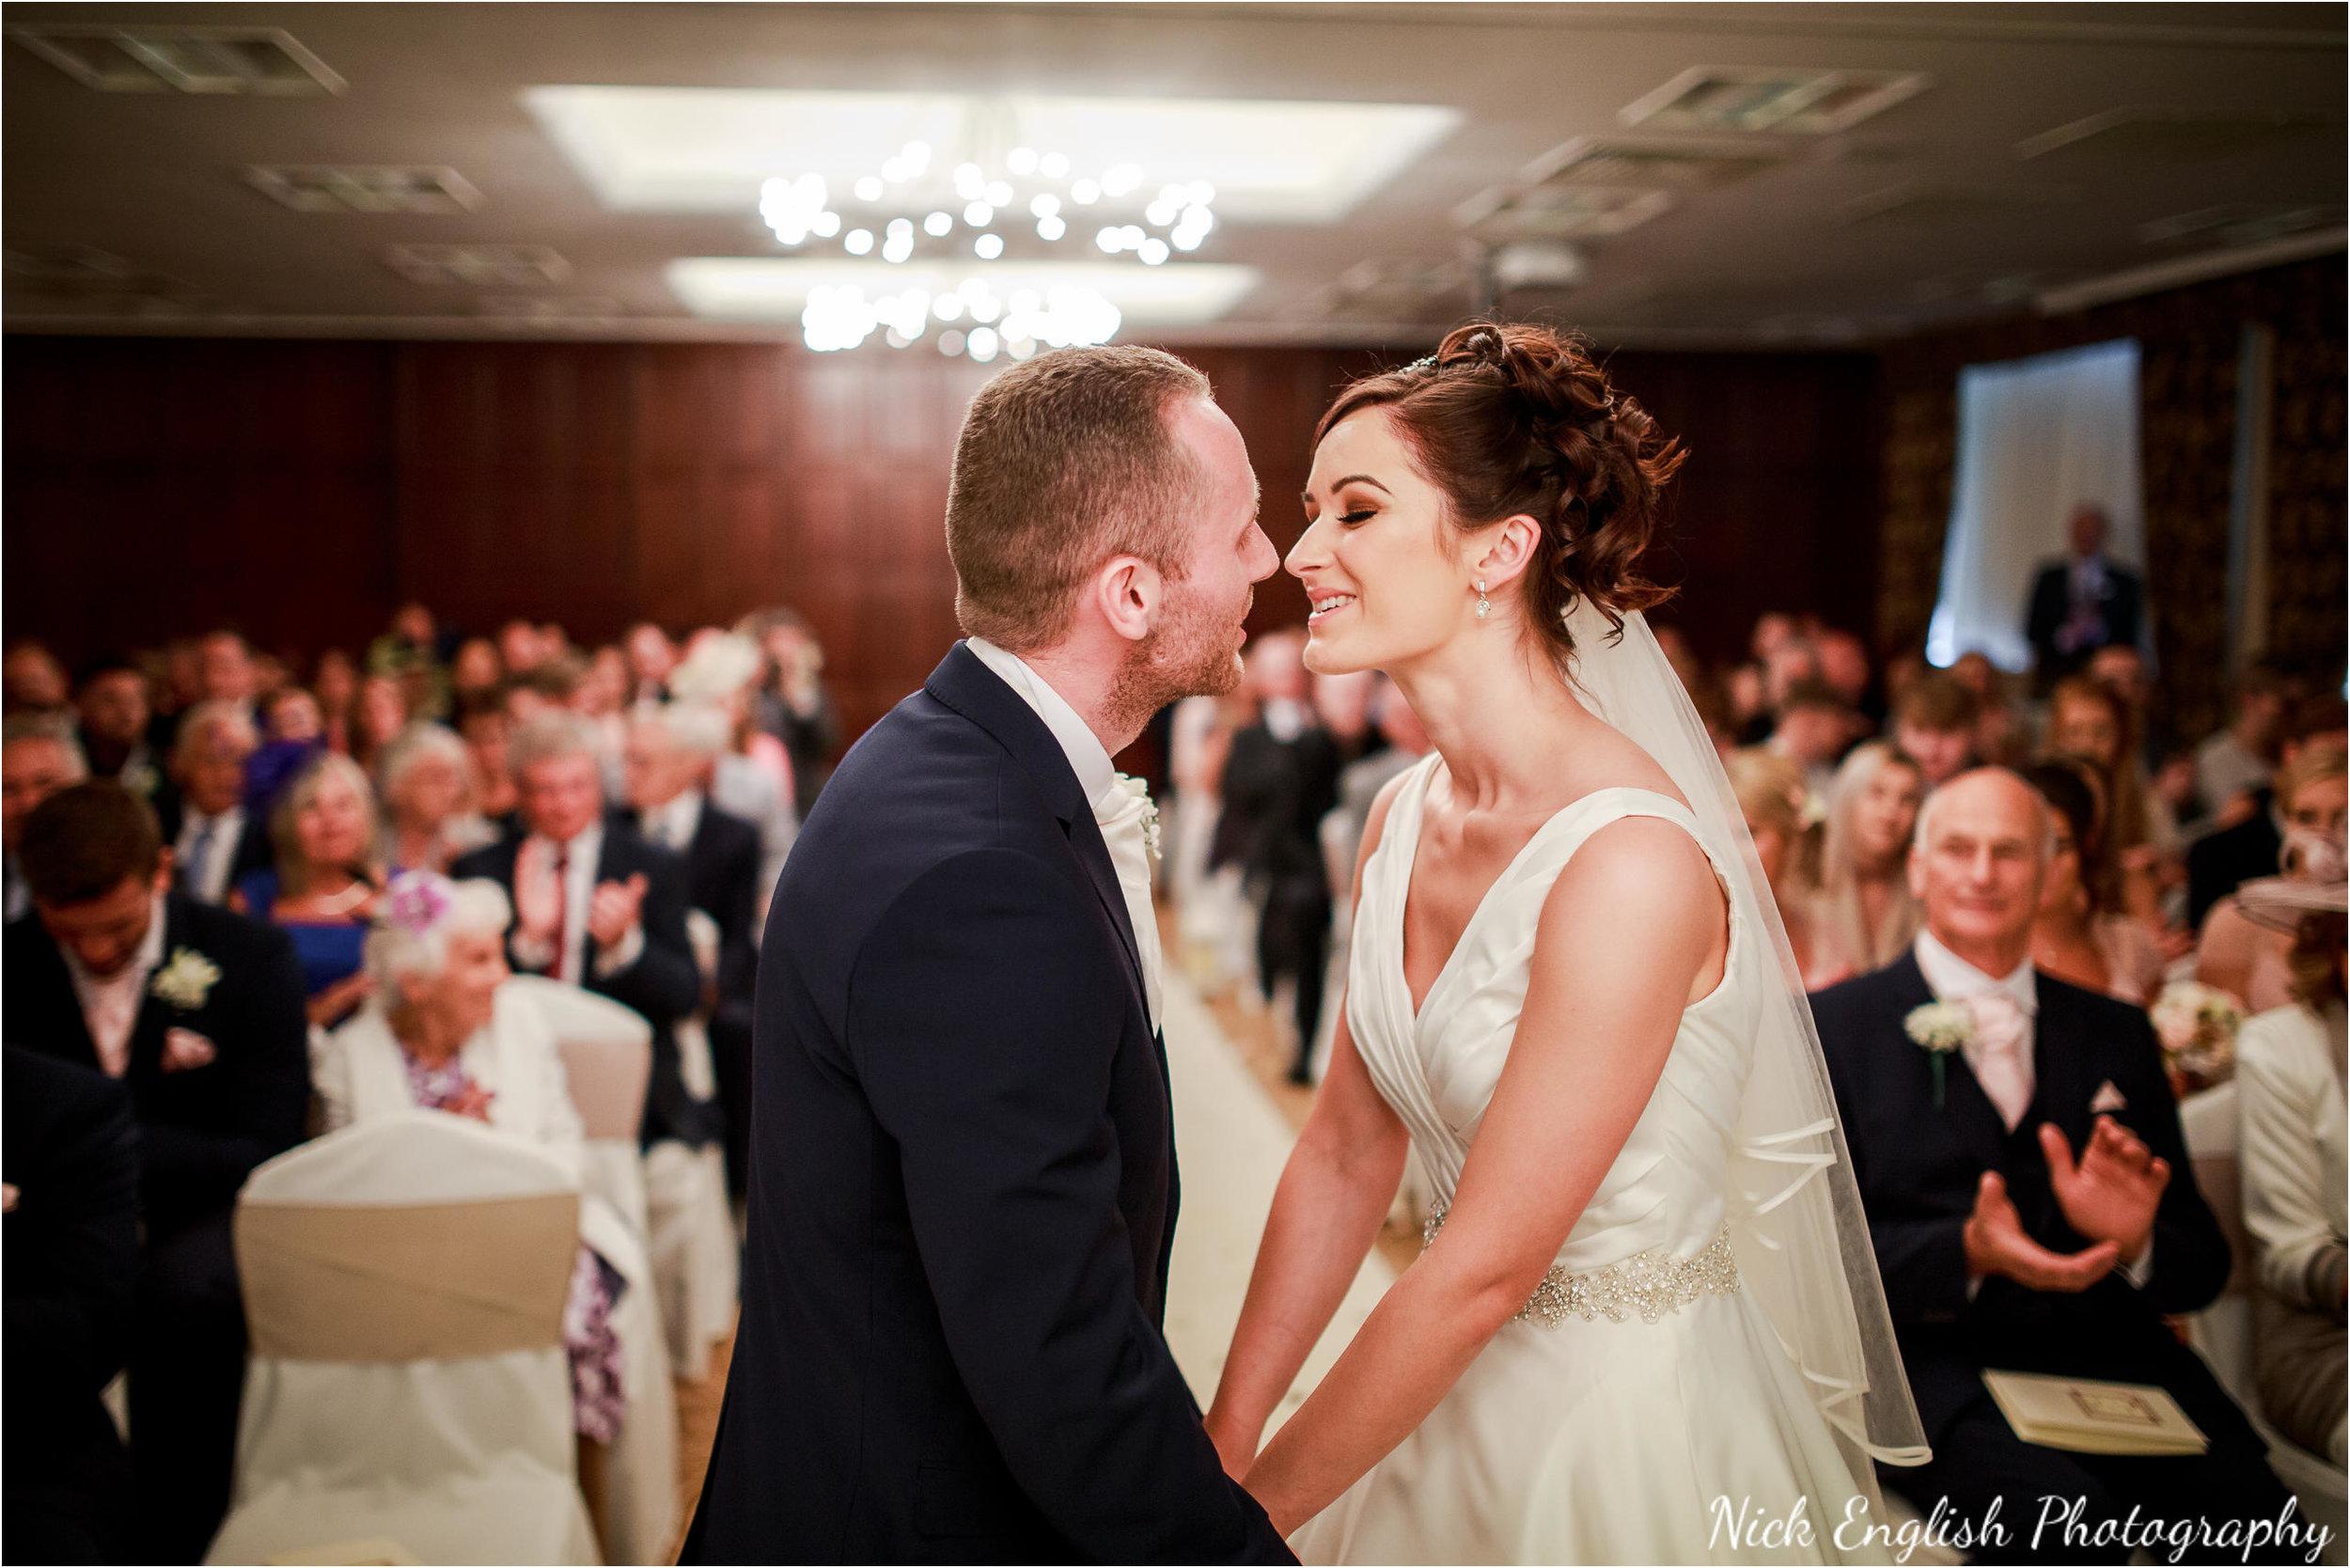 Emily David Wedding Photographs at Barton Grange Preston by Nick English Photography 74jpg.jpeg